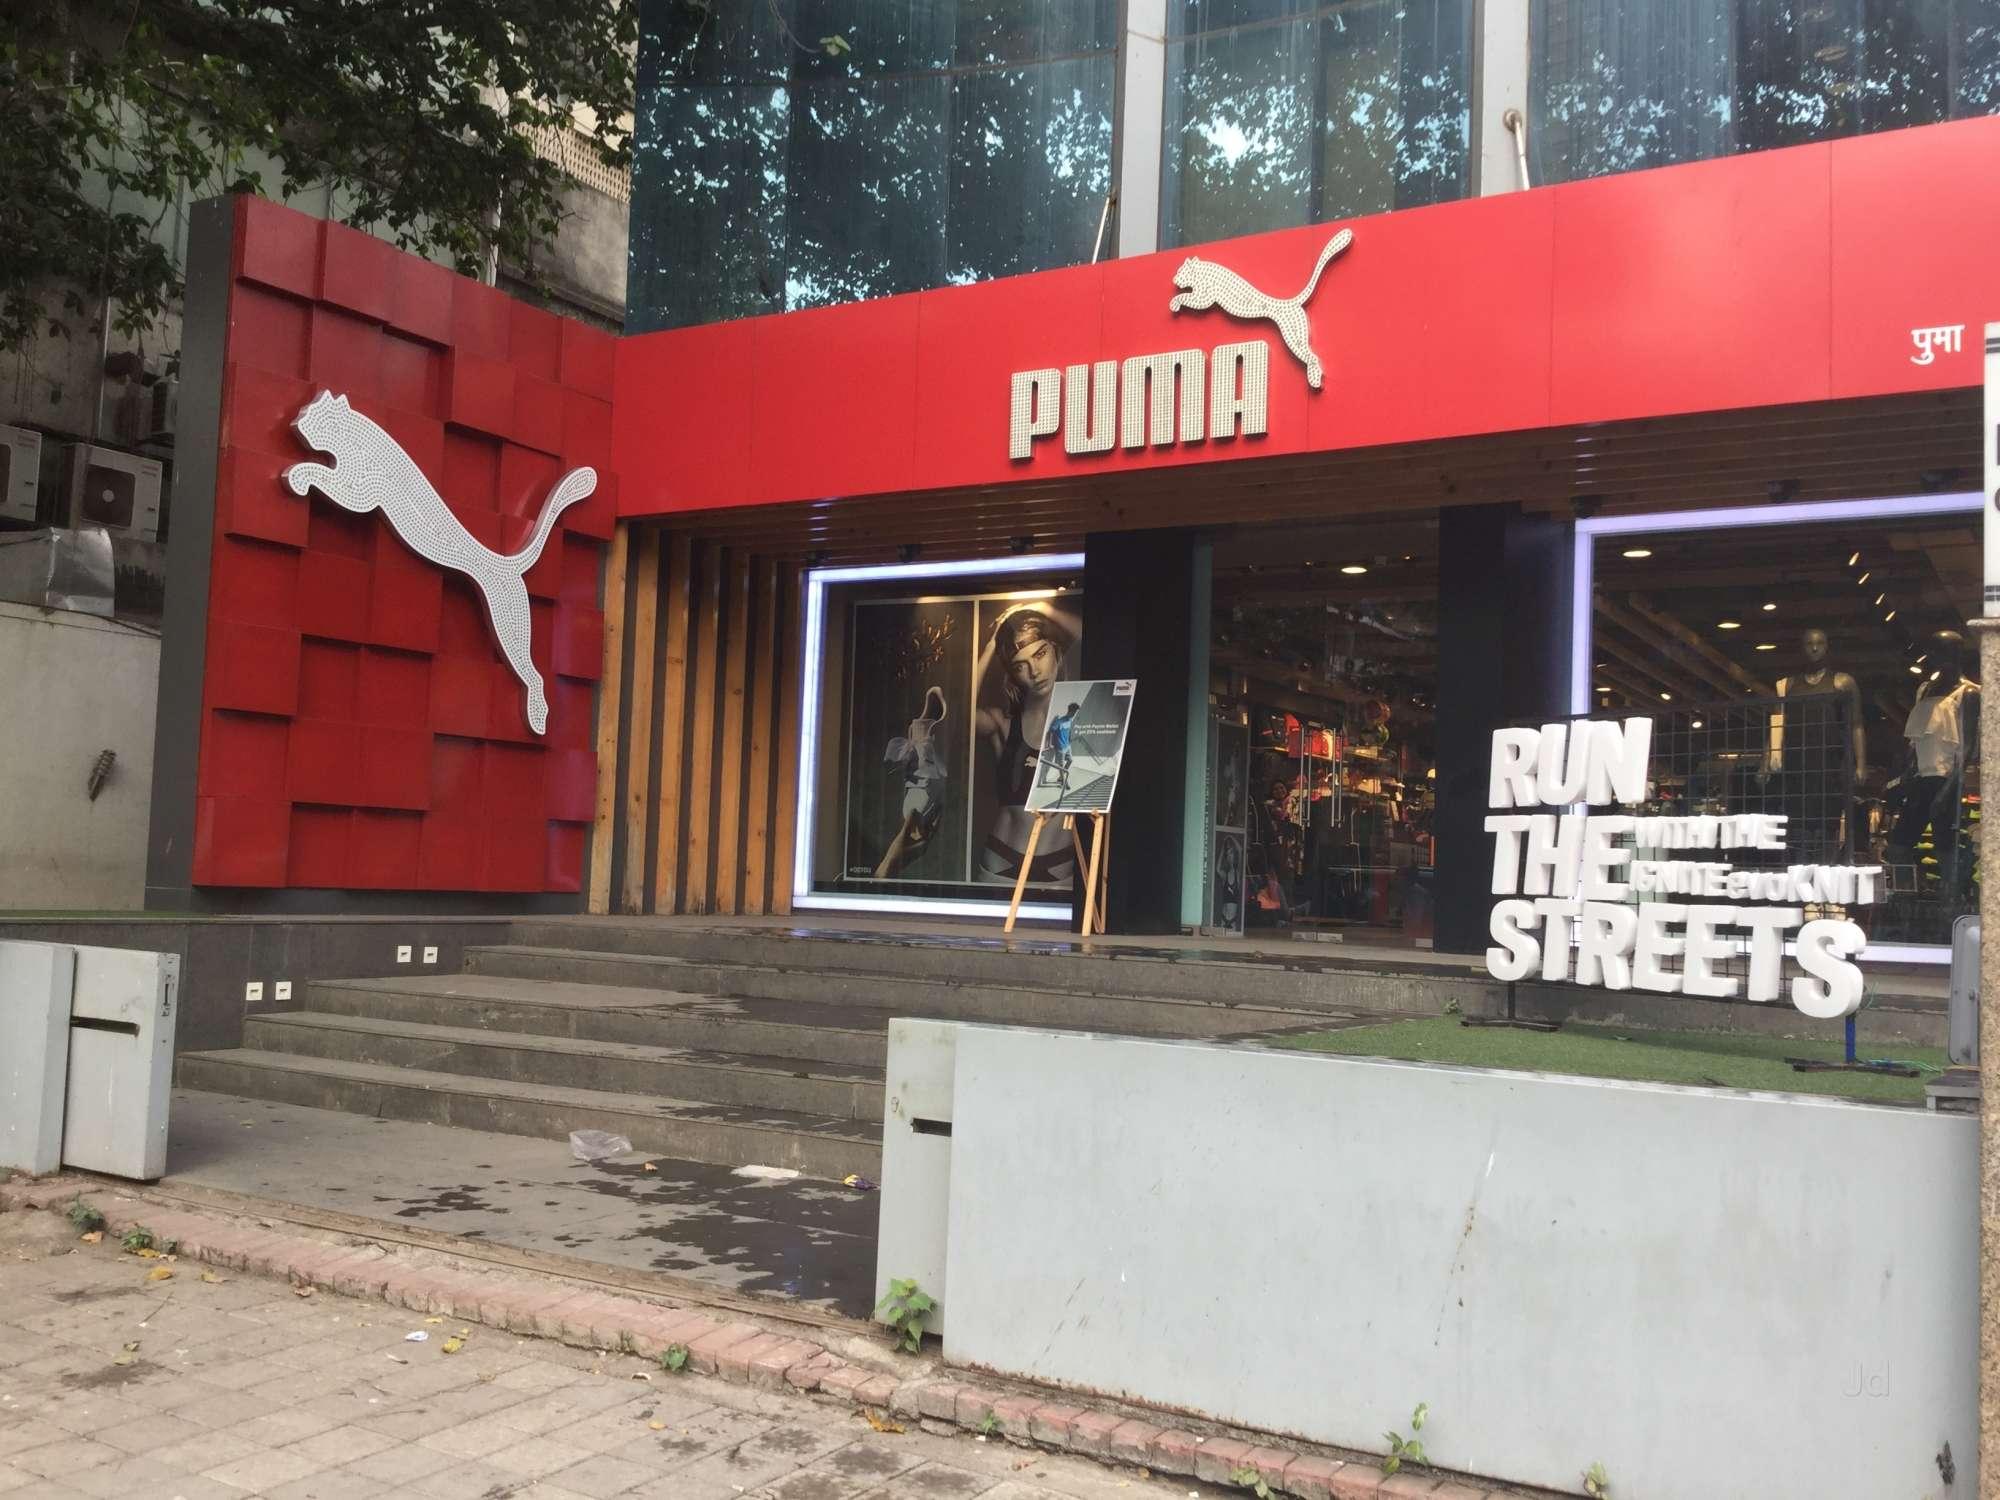 puma headquarters address corporate office phone number. Black Bedroom Furniture Sets. Home Design Ideas